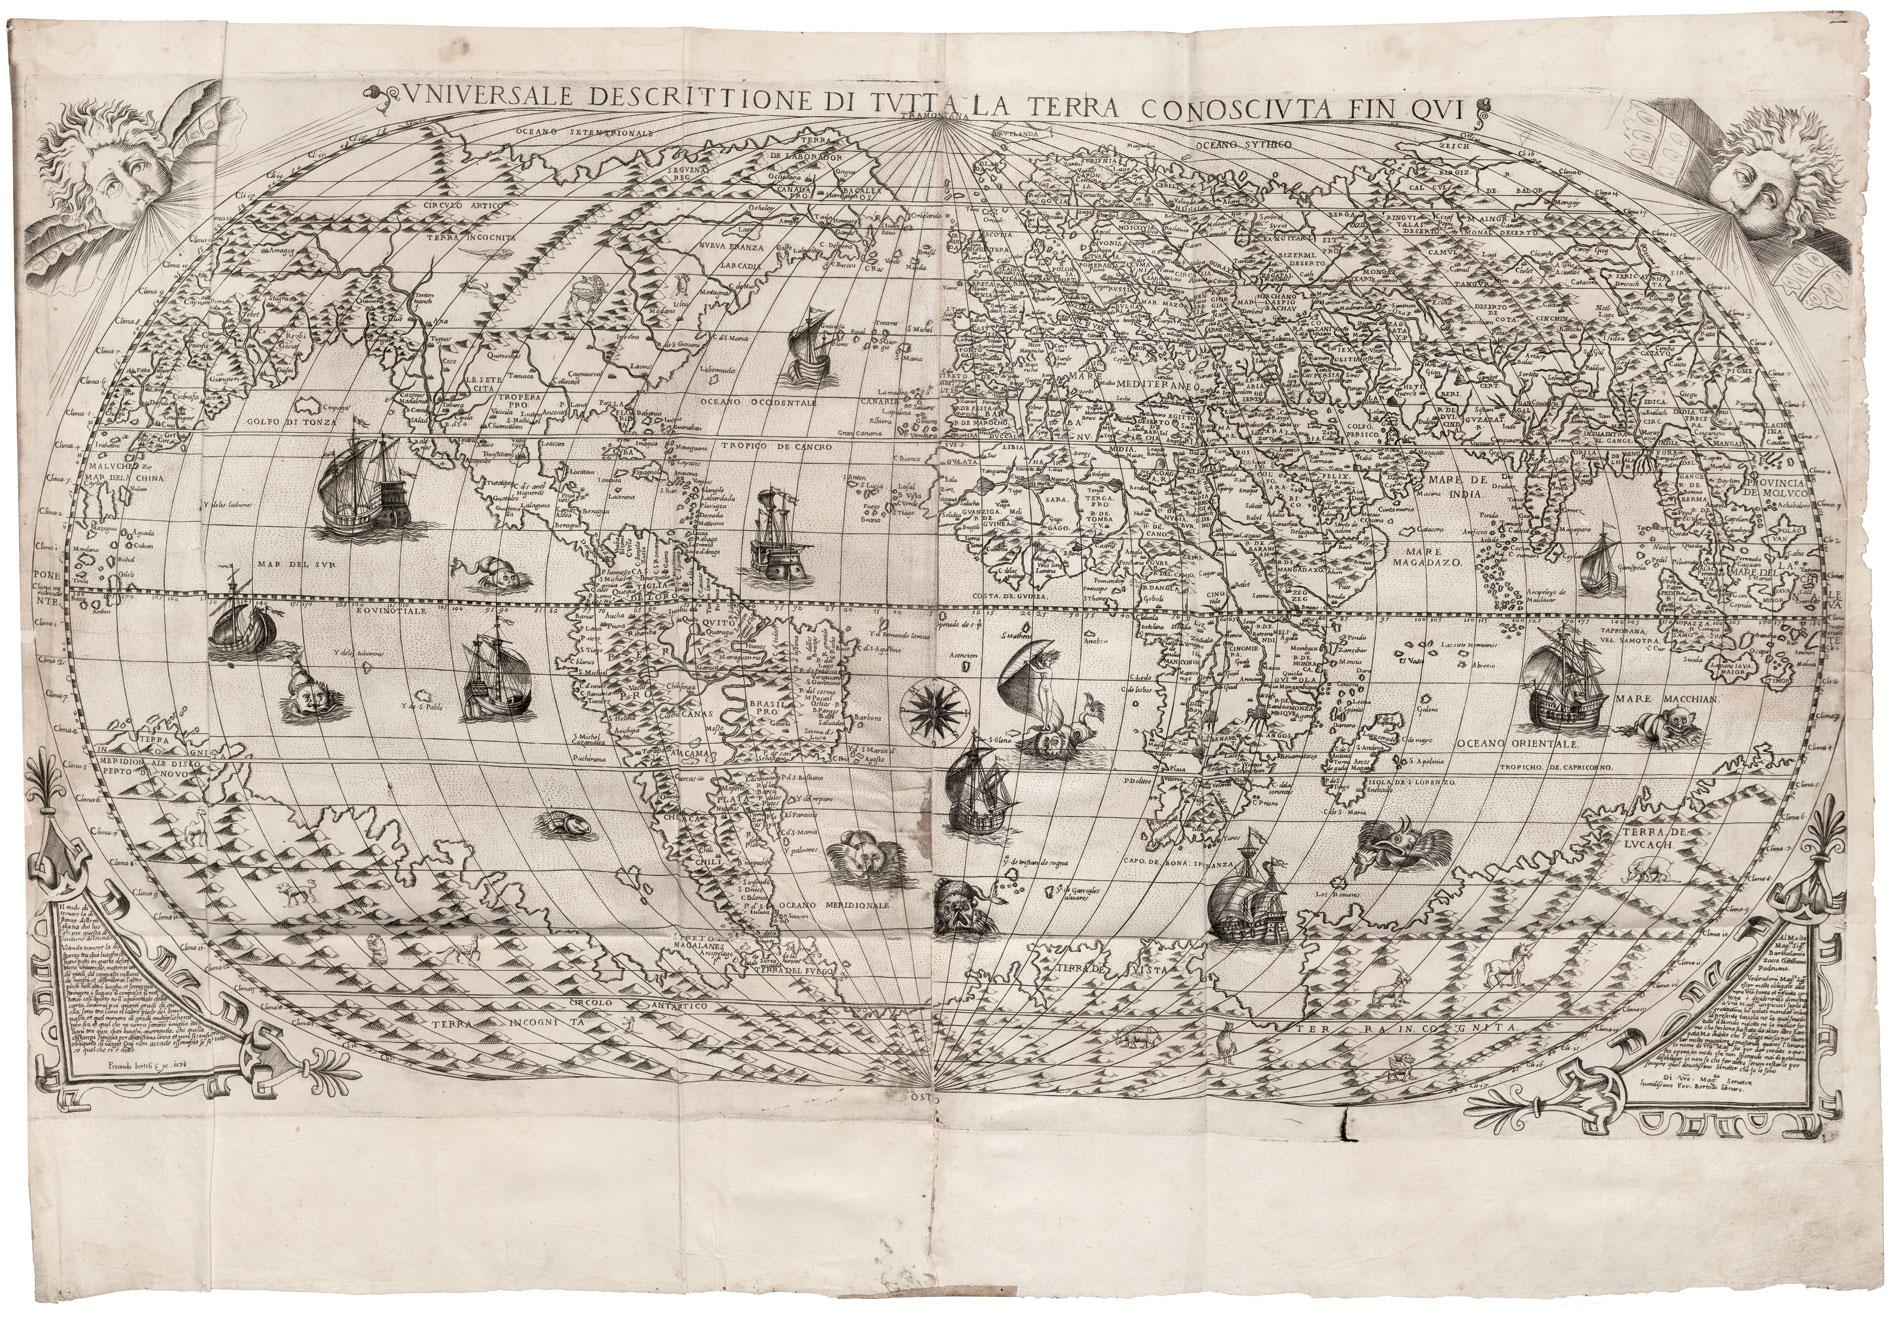 Aus dem Atlas von Antonio Lafreri: Fernando Bertelli, Universale descrittione di tutta la terra conosciuta fin qui, 1571, 44×76 cm; Bayerische Staatsbibliothek, München